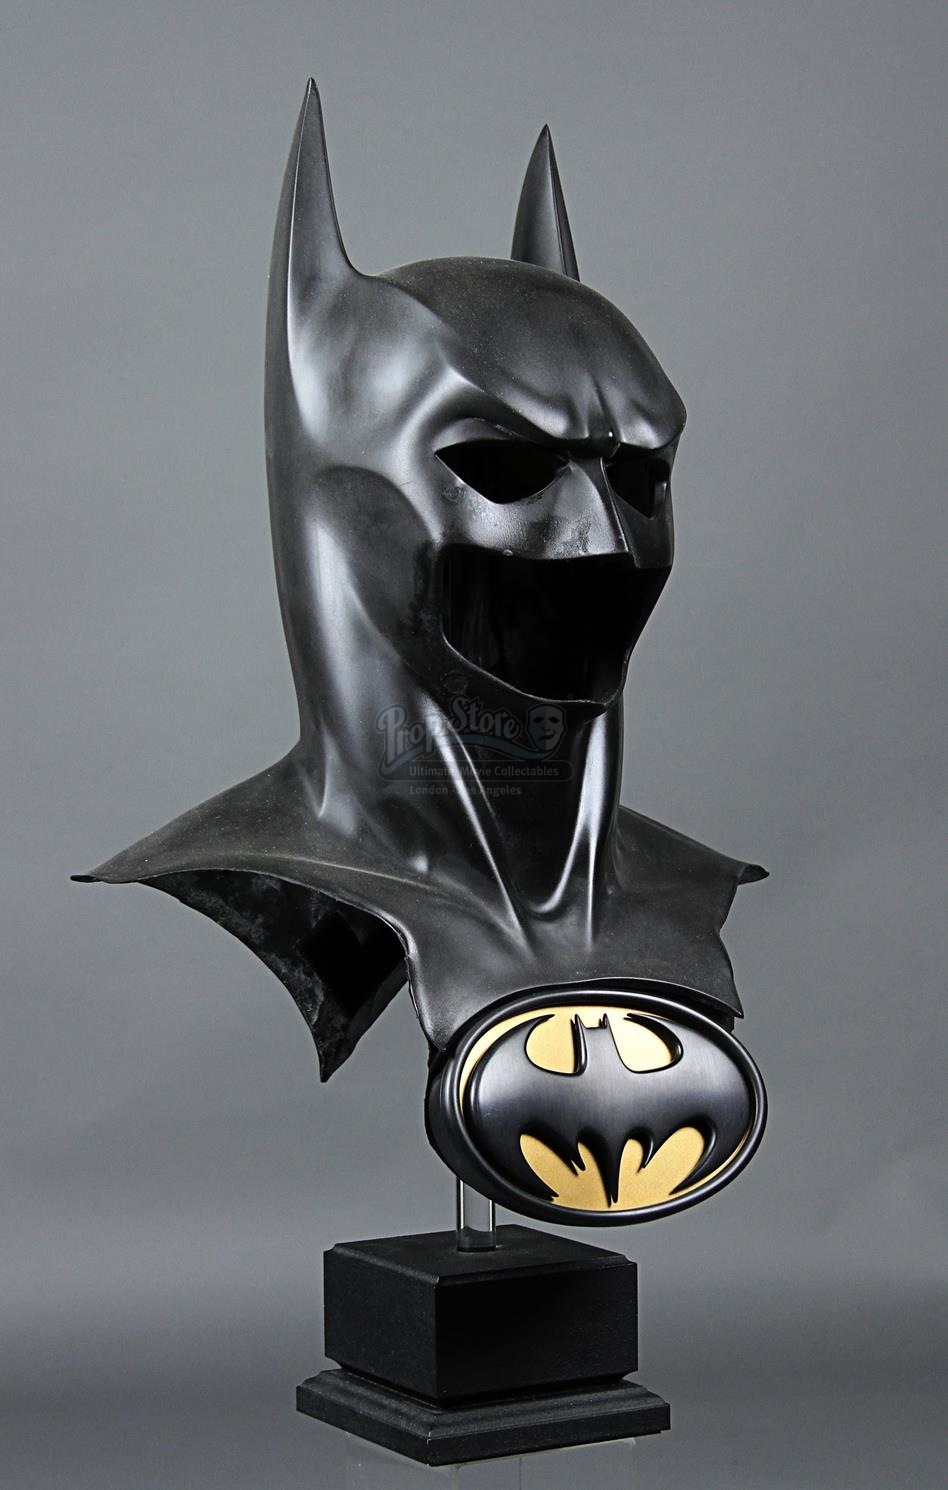 BATMAN FOREVER (1995) - Batman's (Val Kilmer) Batsuit Cowl ...